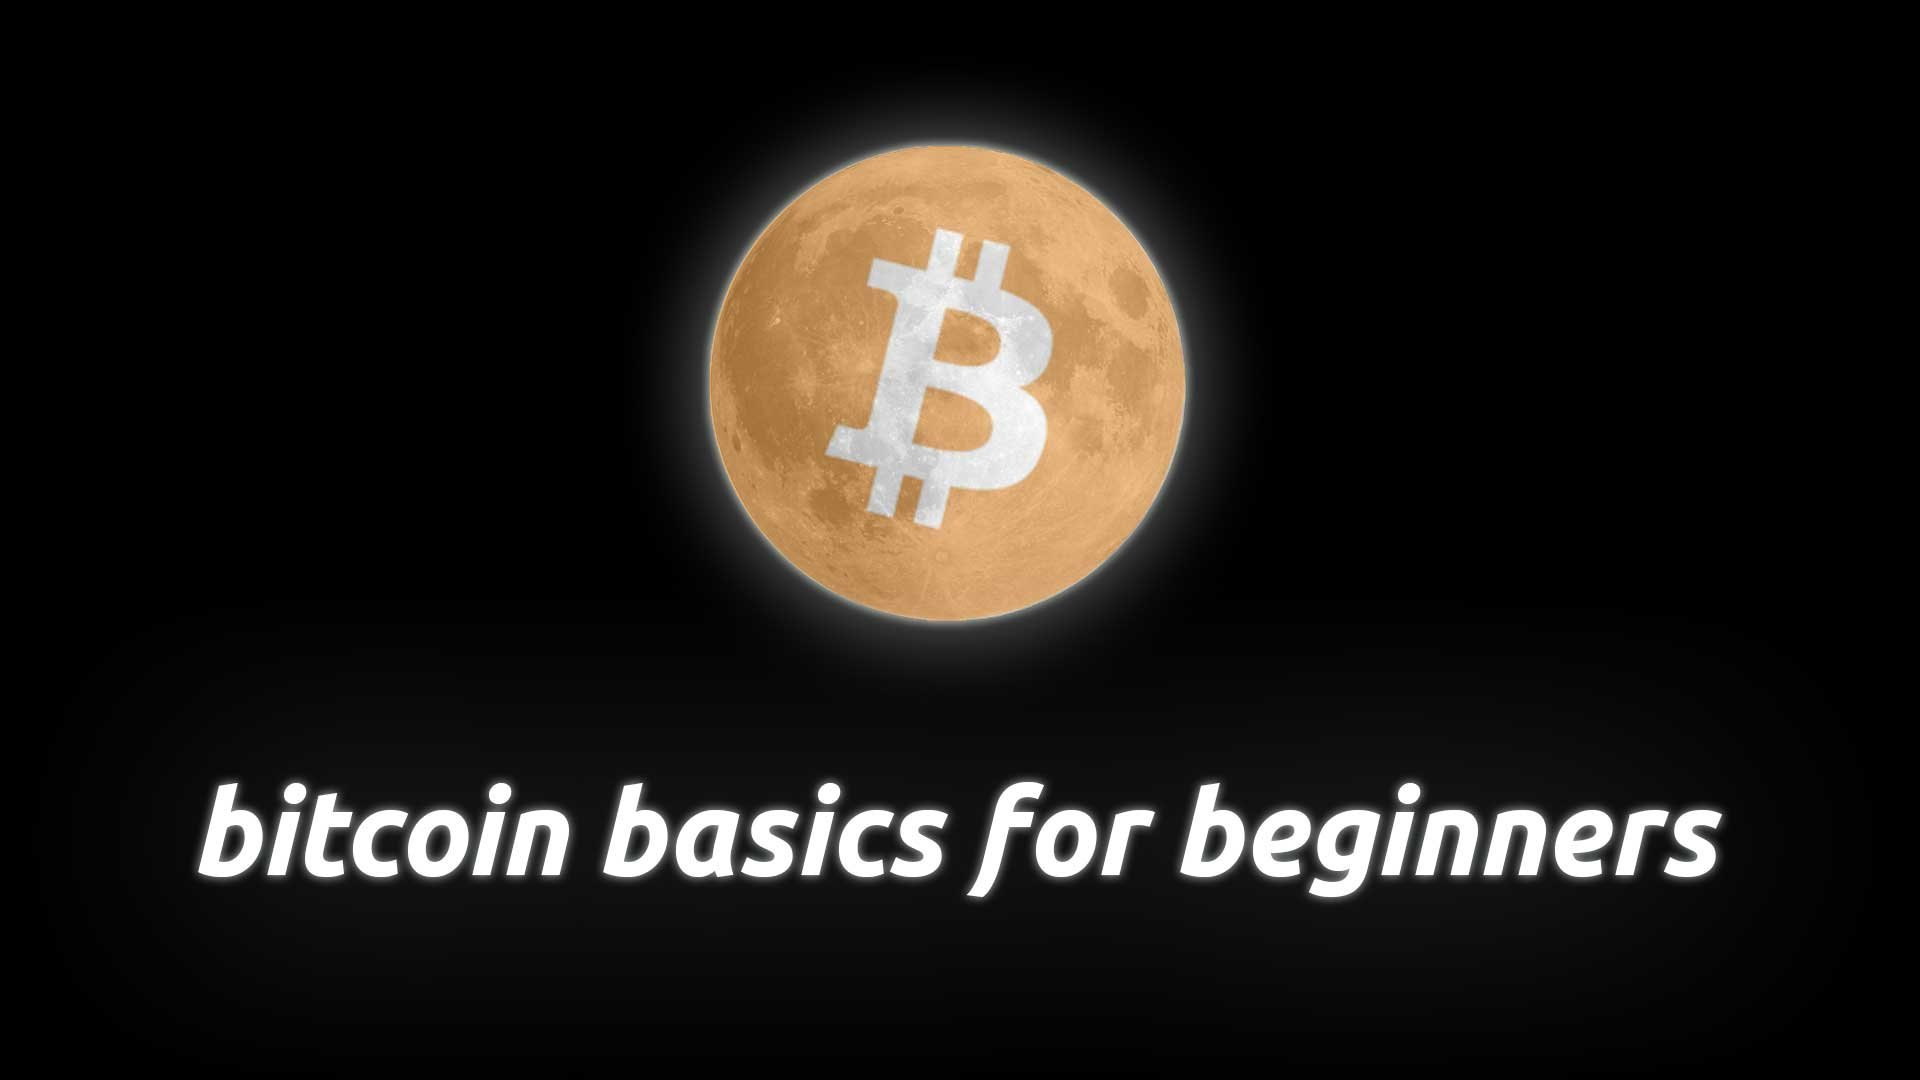 Bitcoin Skills: Basics for Beginners